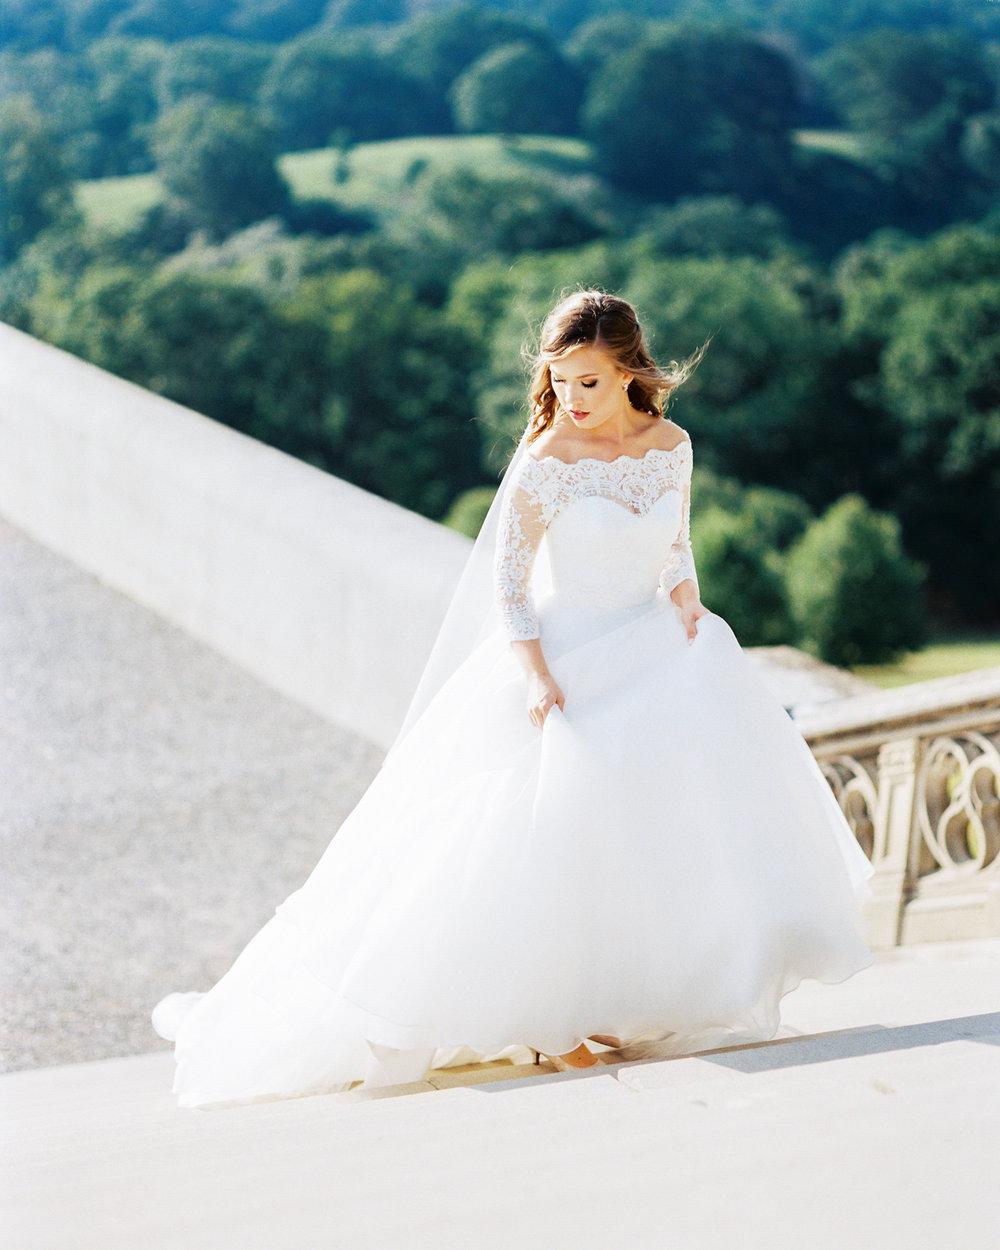 timeless-classy-cathedral-veil-bridal-session-biltmore-north-carolina-wedding-film-photographer-6.jpg